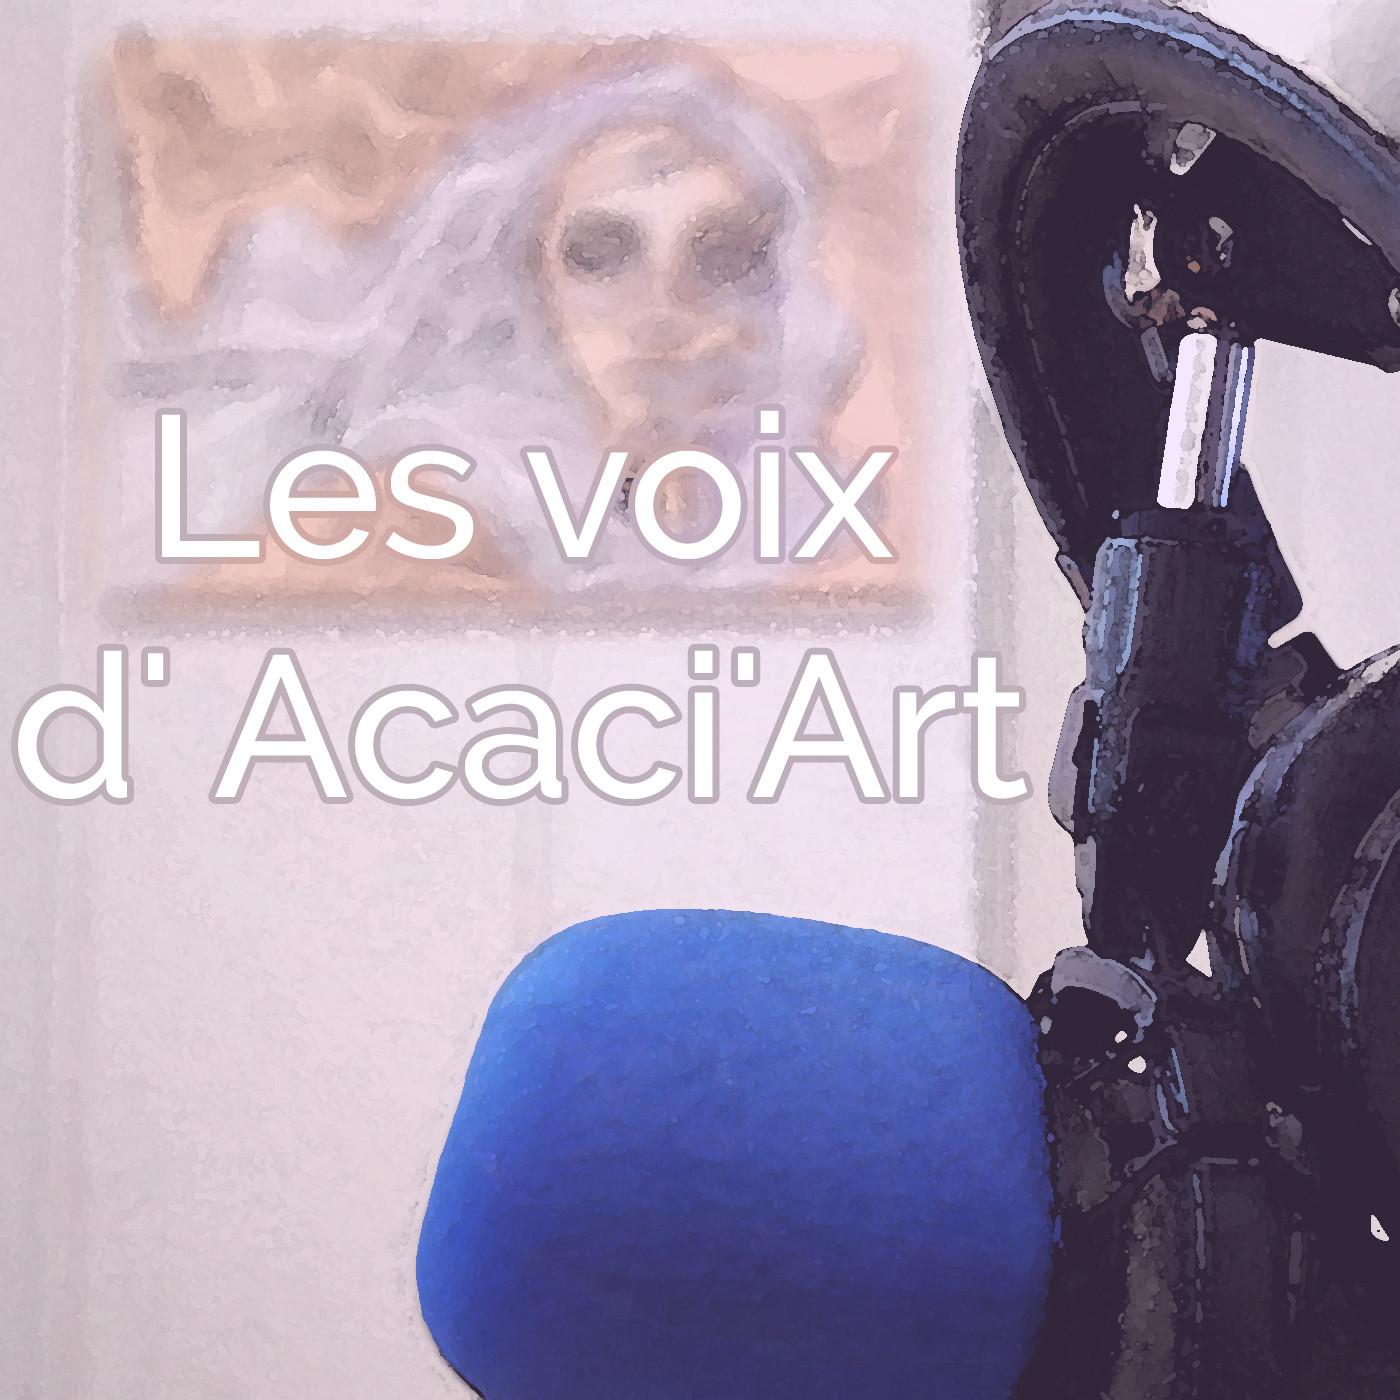 Les voix d'Acaci'Art - Cyril Larvor alias Black Bird - Street-artist